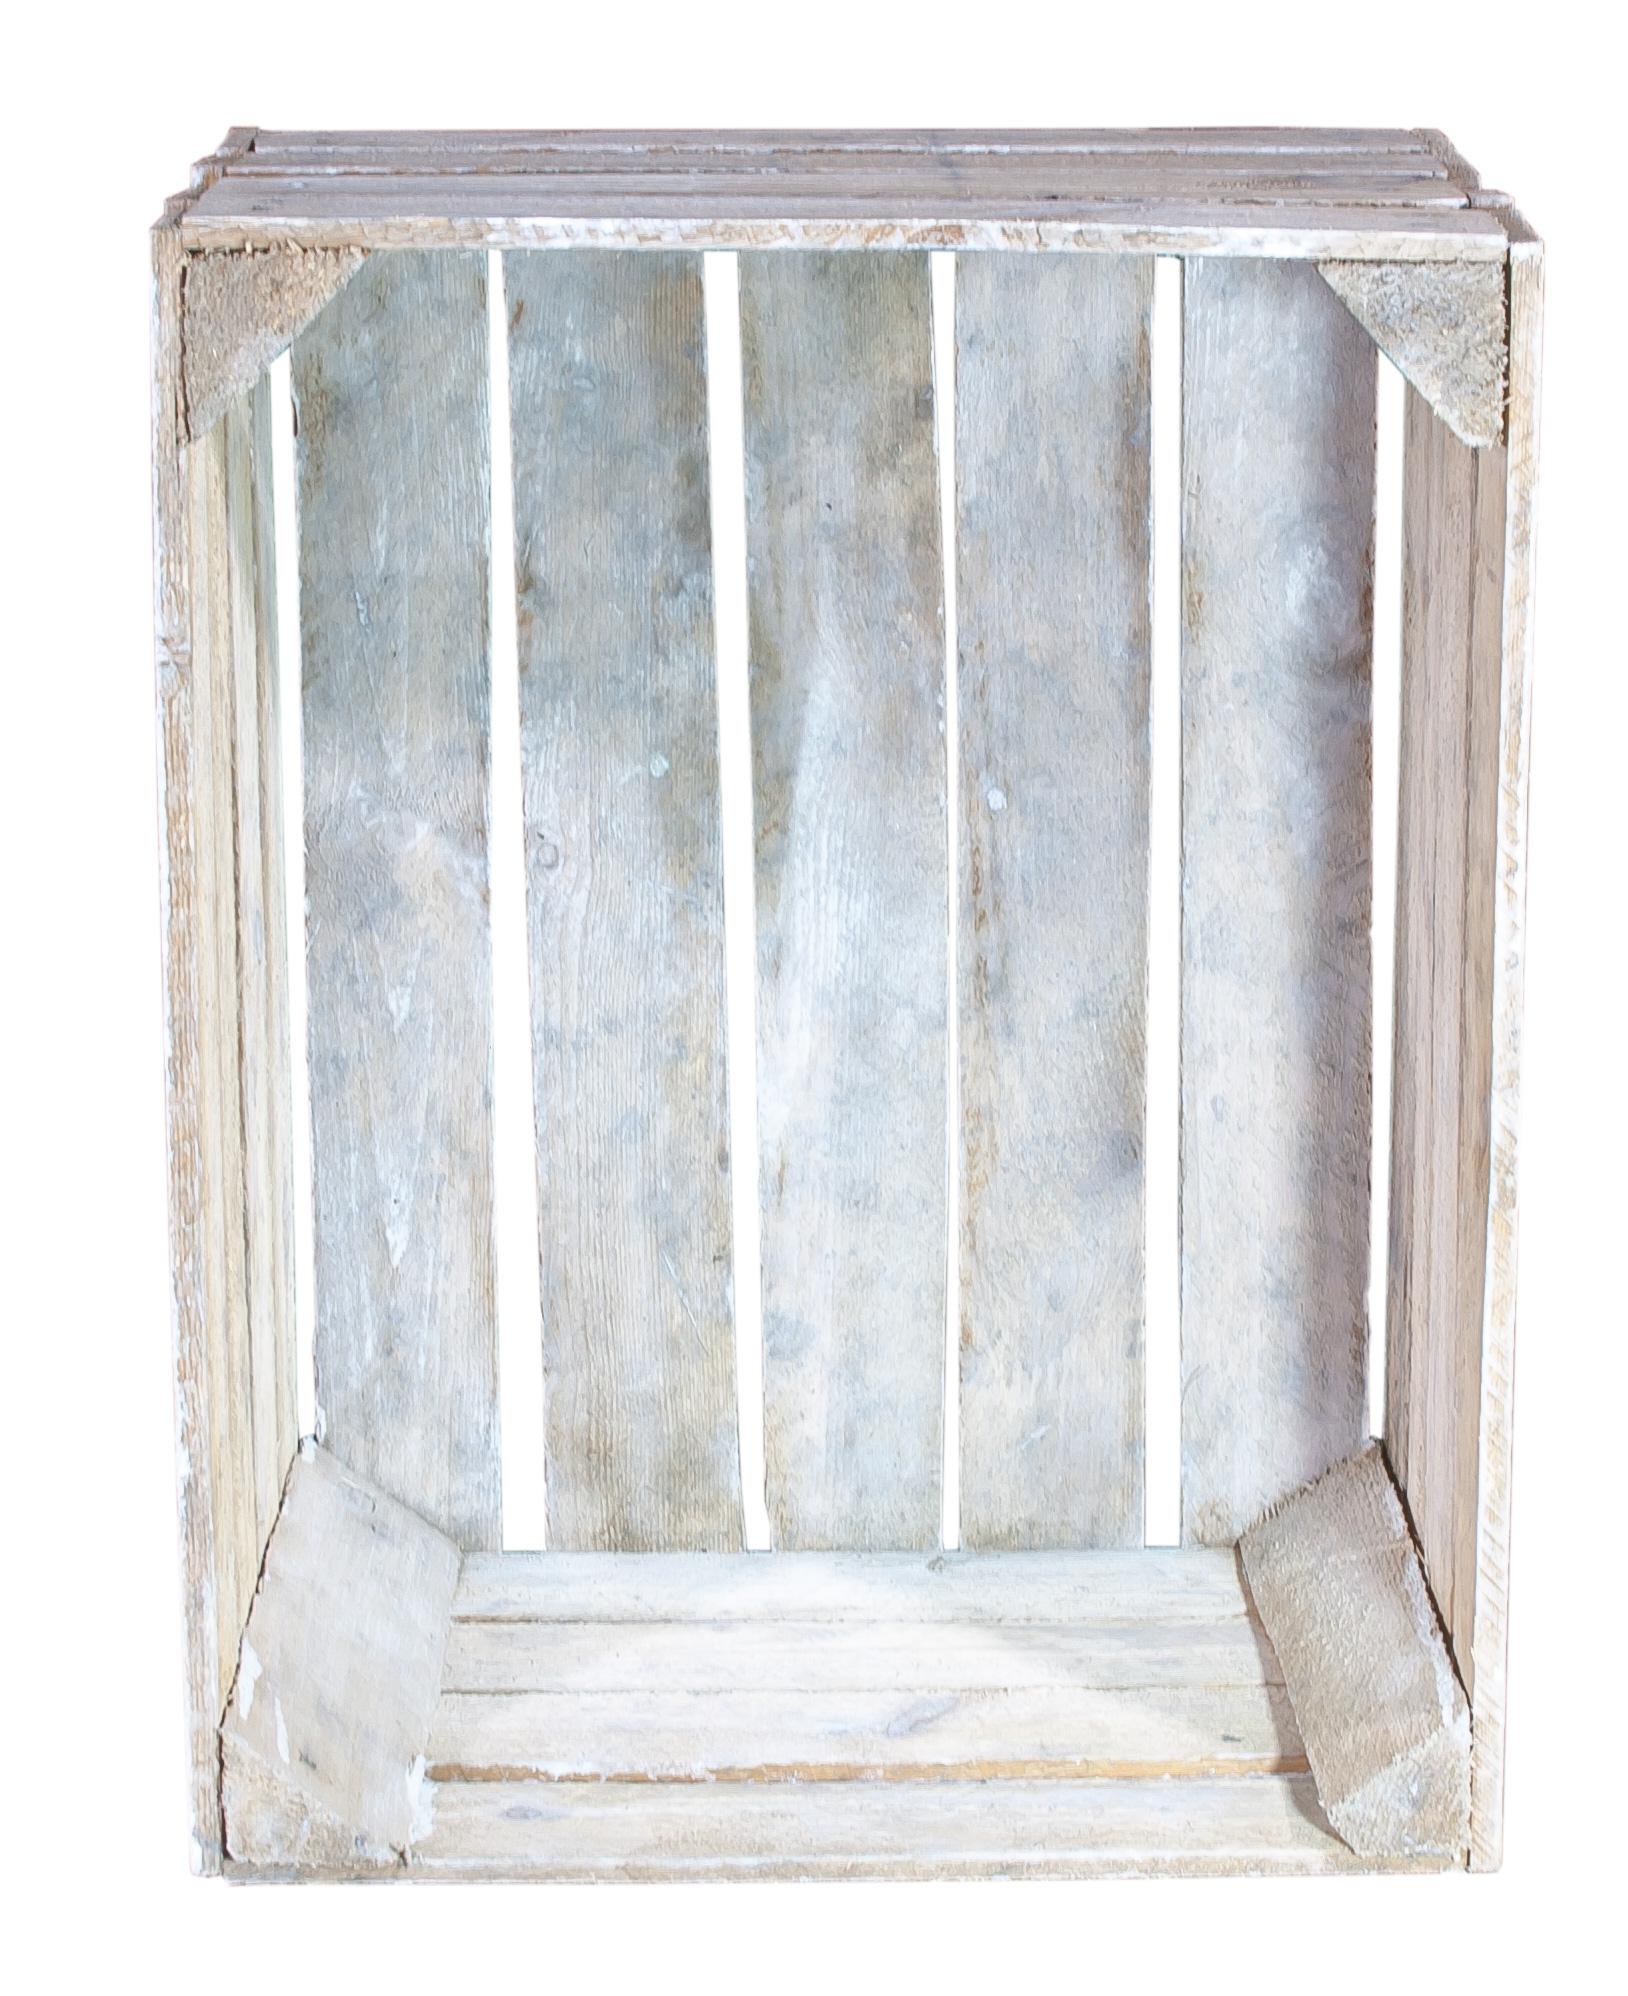 used look kisten shabby chic vintage holzkiste 50x40x30cm. Black Bedroom Furniture Sets. Home Design Ideas